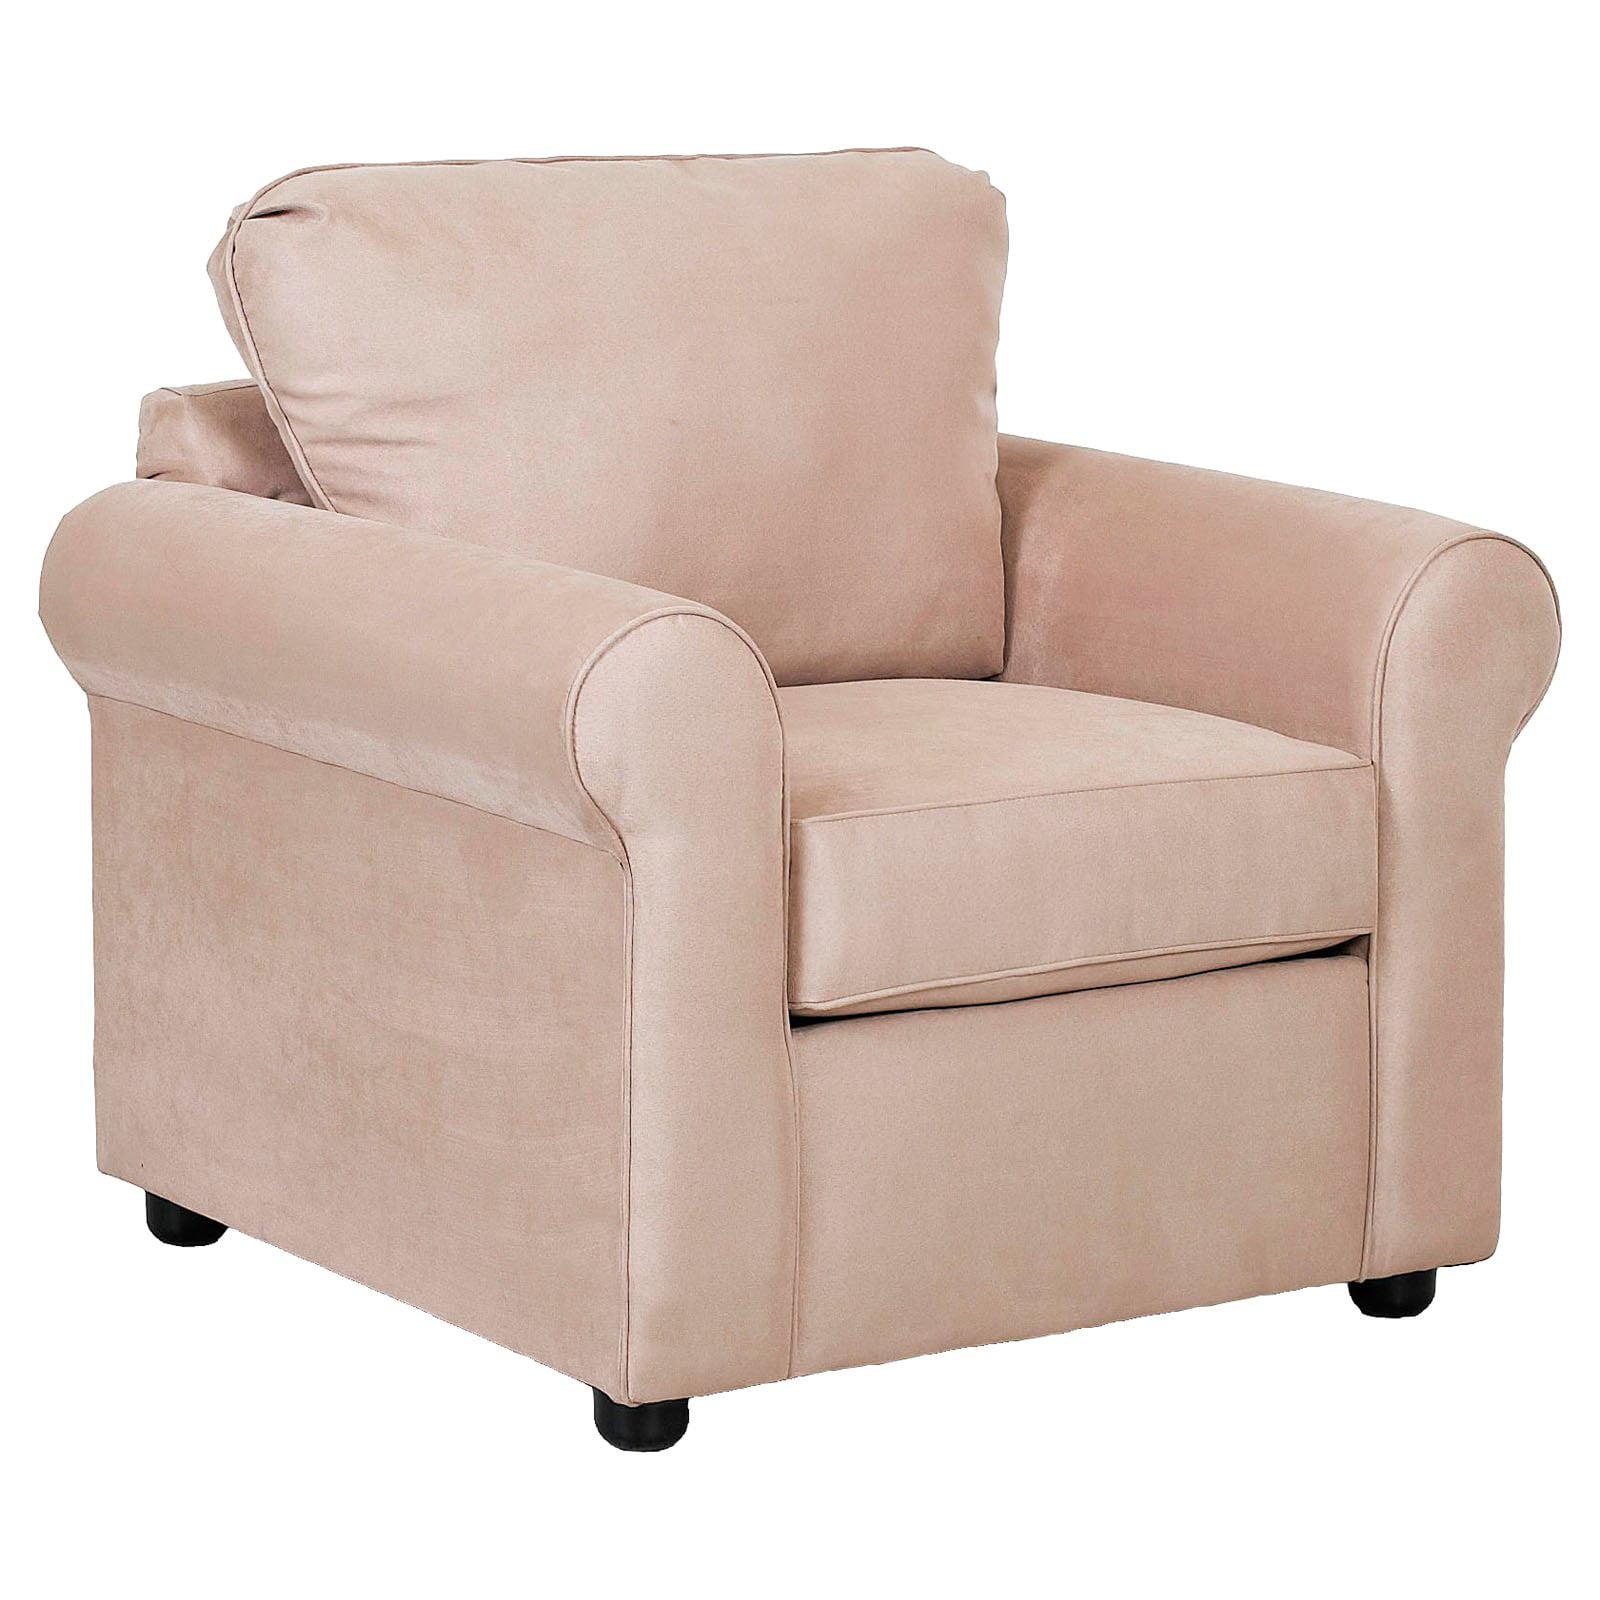 Klaussner Brighton Microfiber Chair by Klaussner Furniture